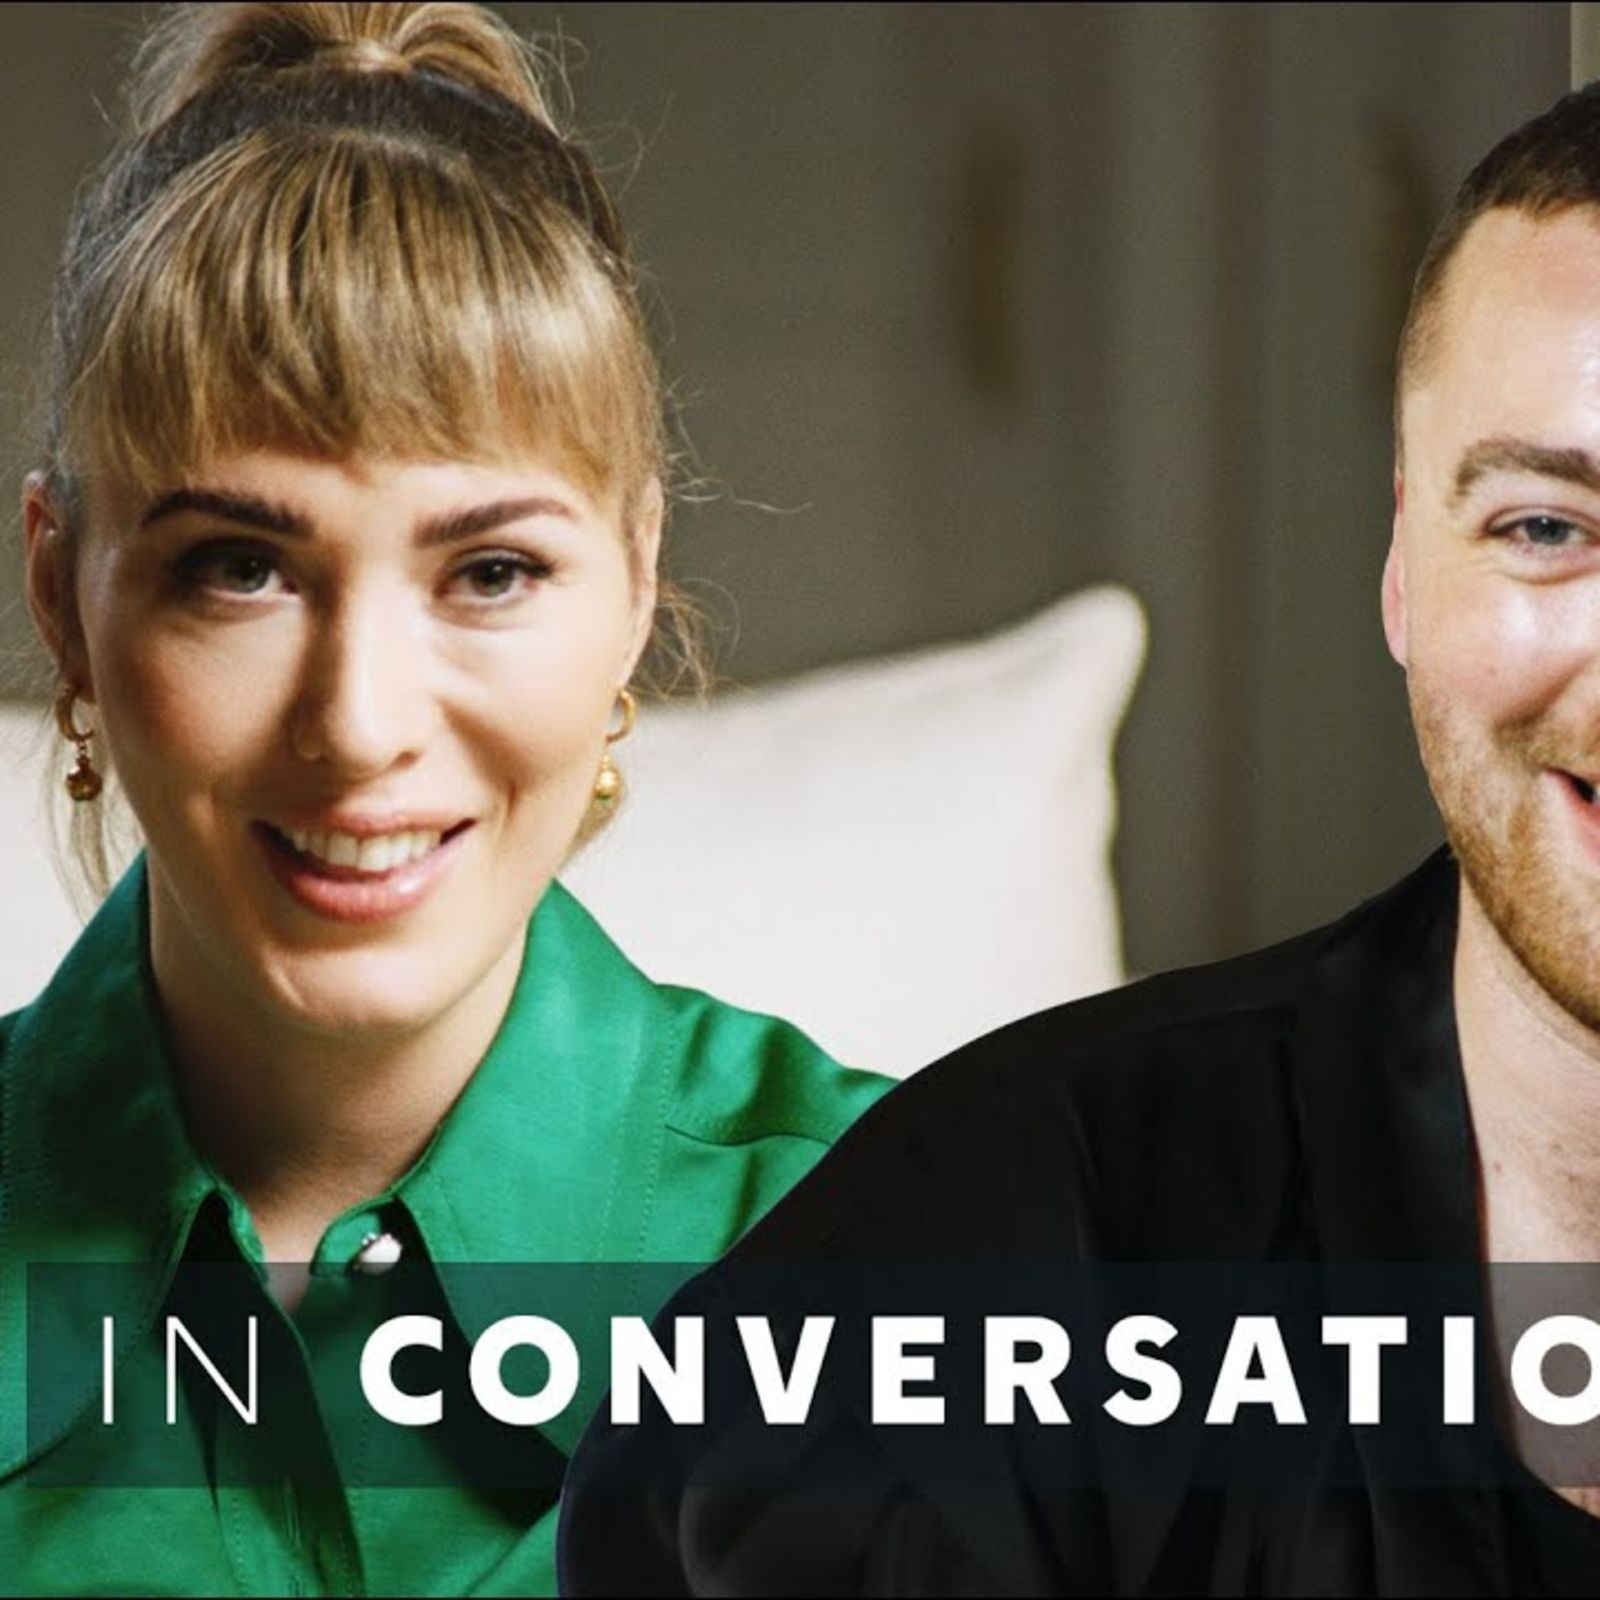 Sam Smith Talks Gender Identity, Break-Ups and Stage Fright